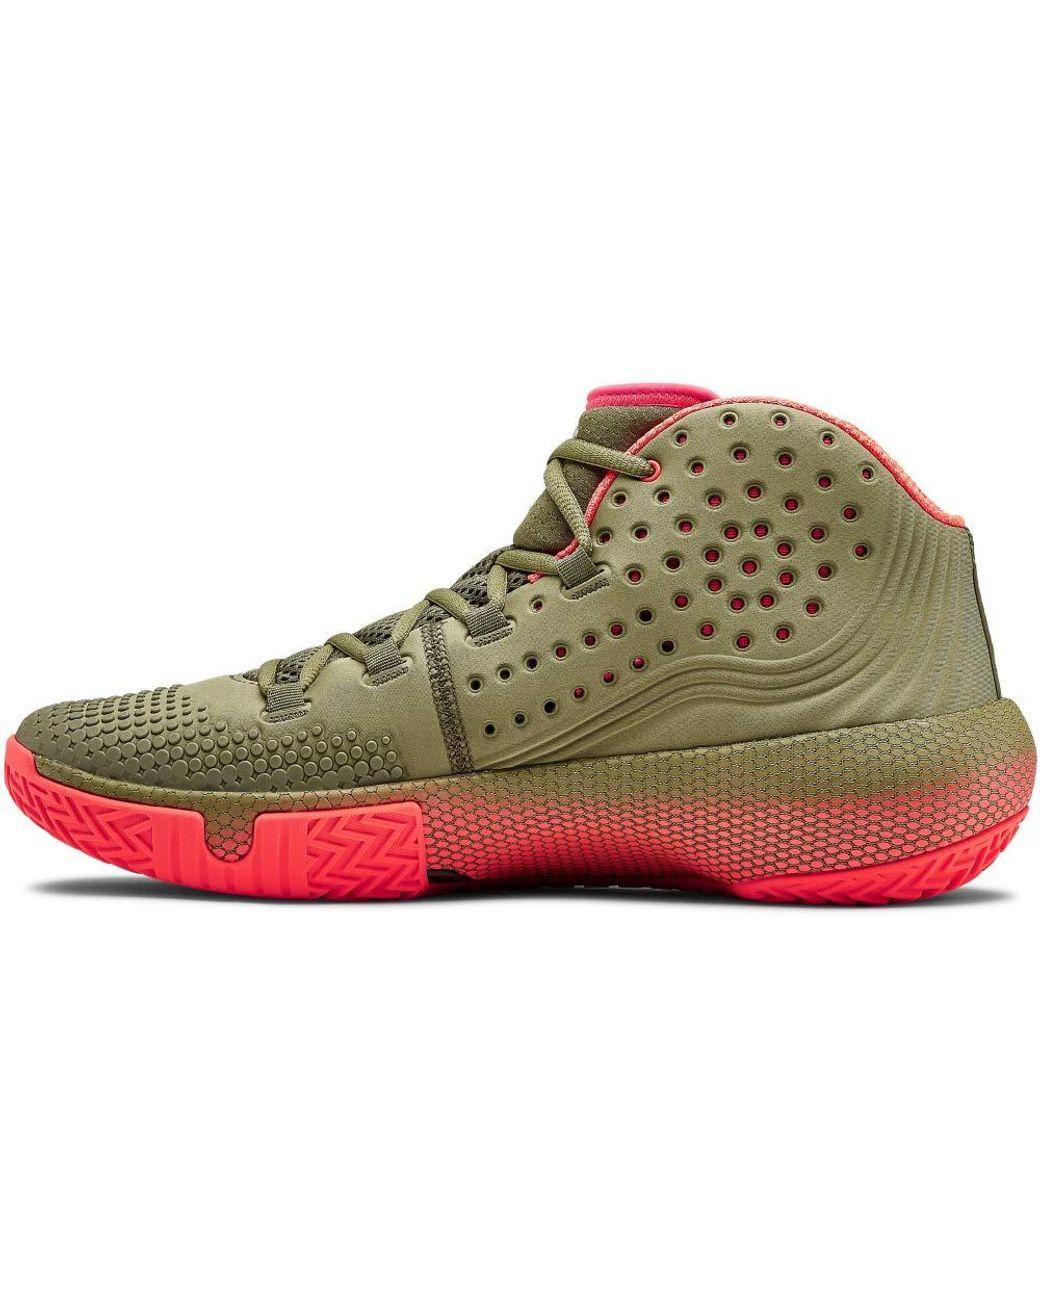 Under Armour UA HOVR Havoc 2 Chaussures de Basketball Homme